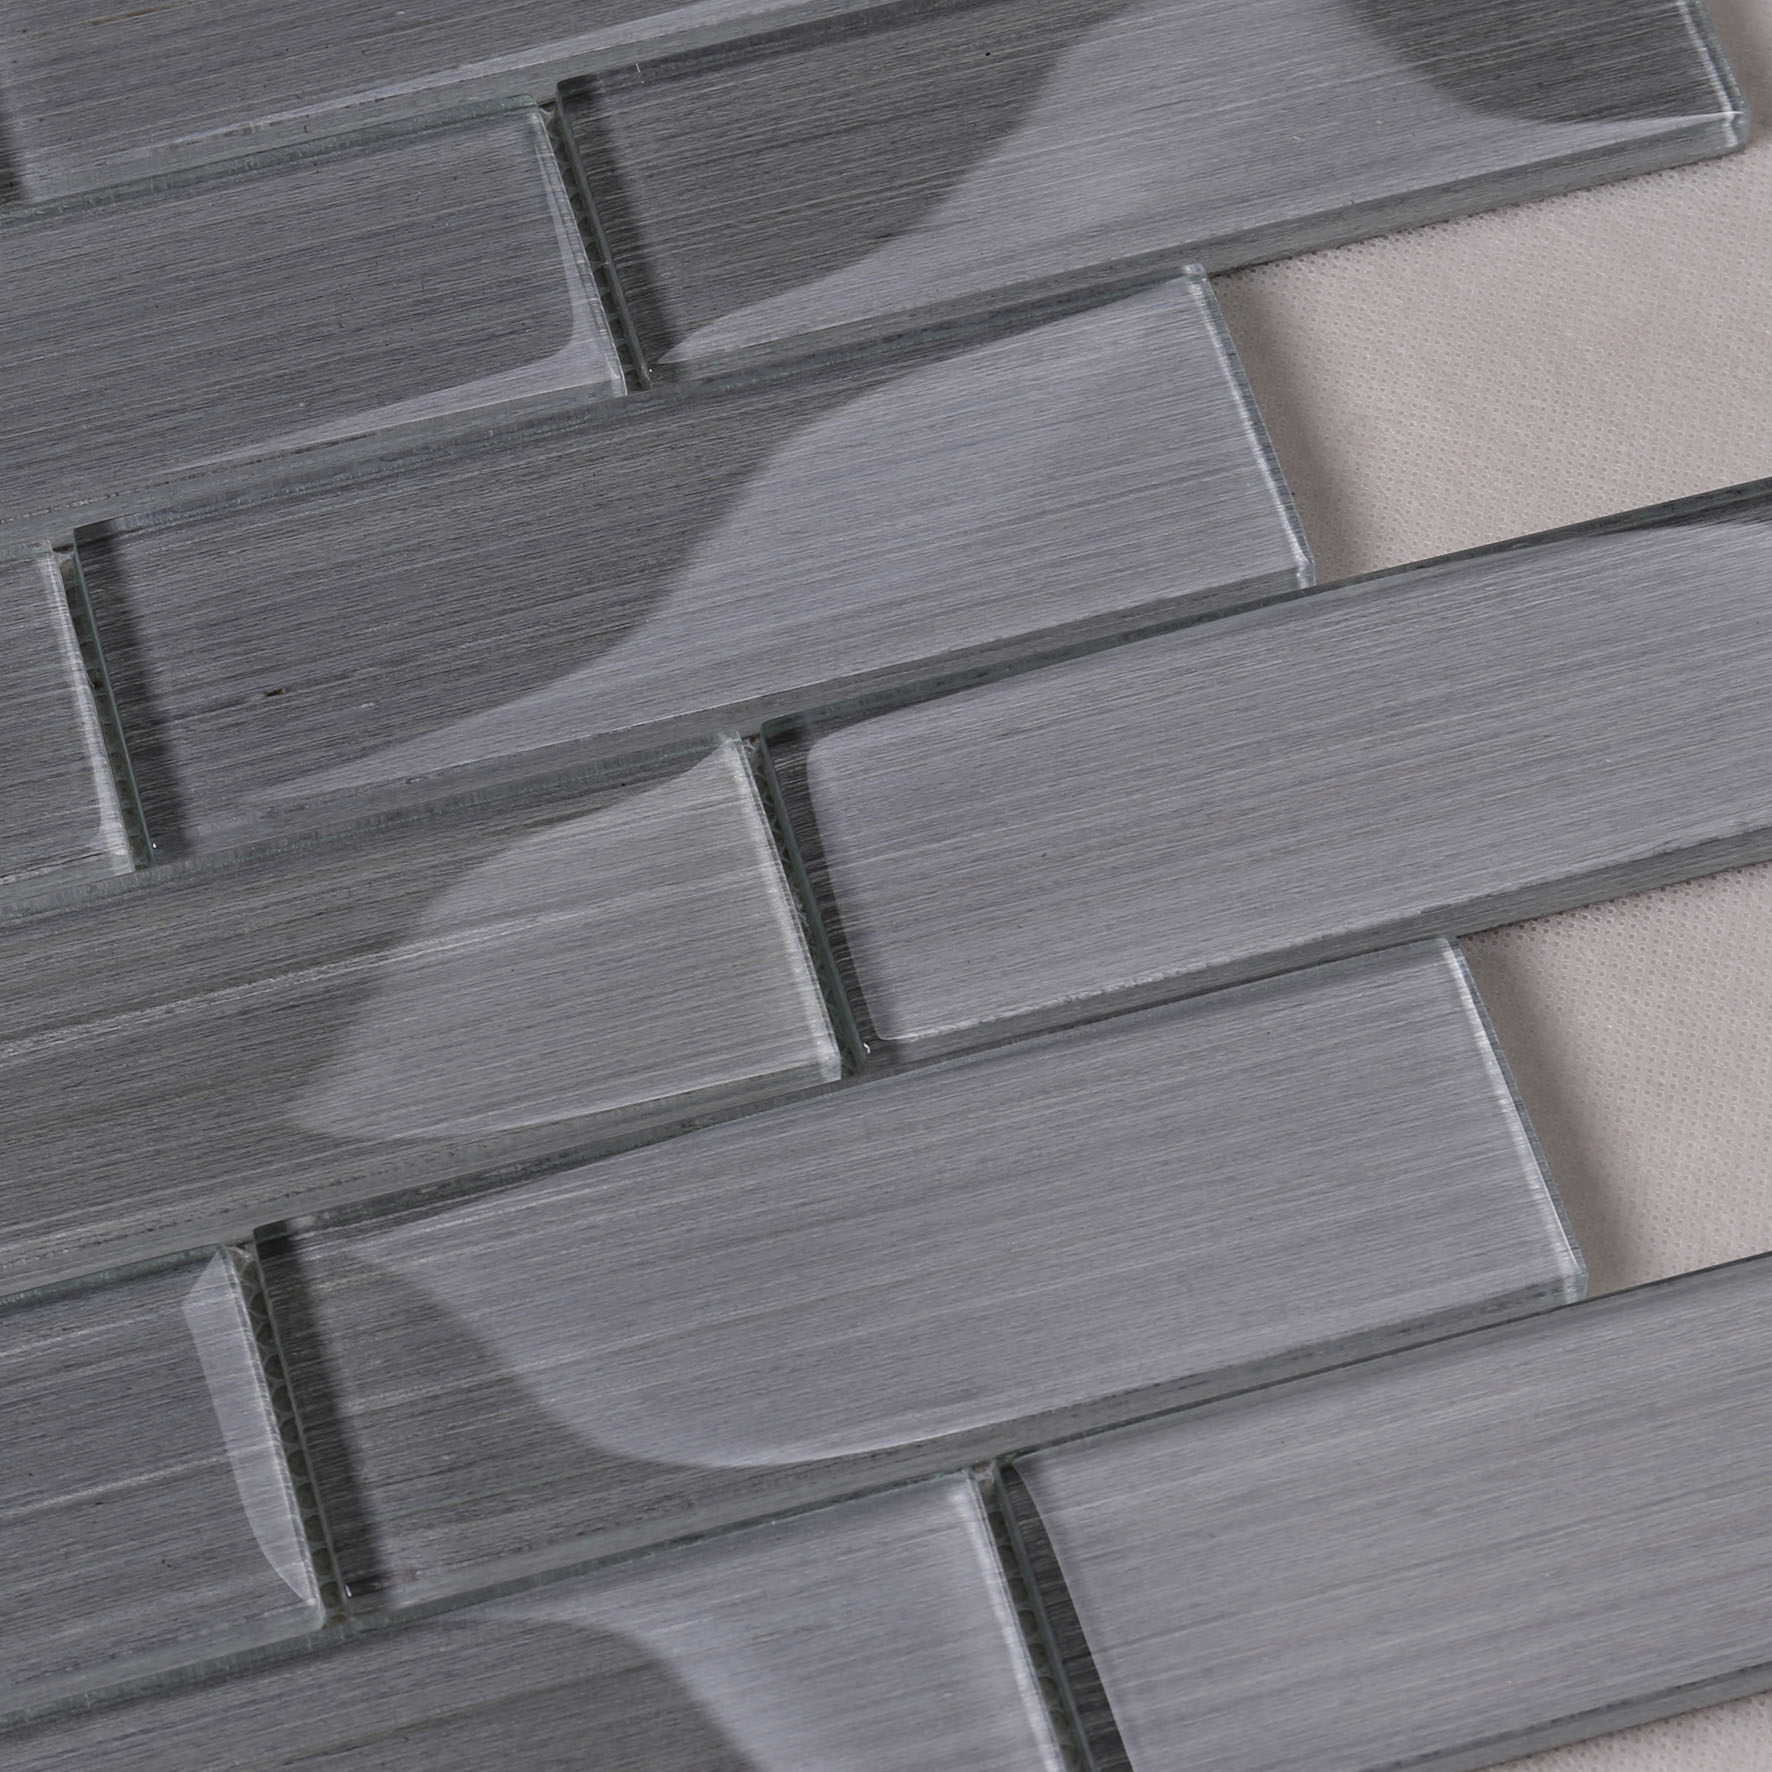 Heng Xing-Glass Wall Tiles, White Glass Backsplash Manufacturer   Glass Mosaic Tile-4